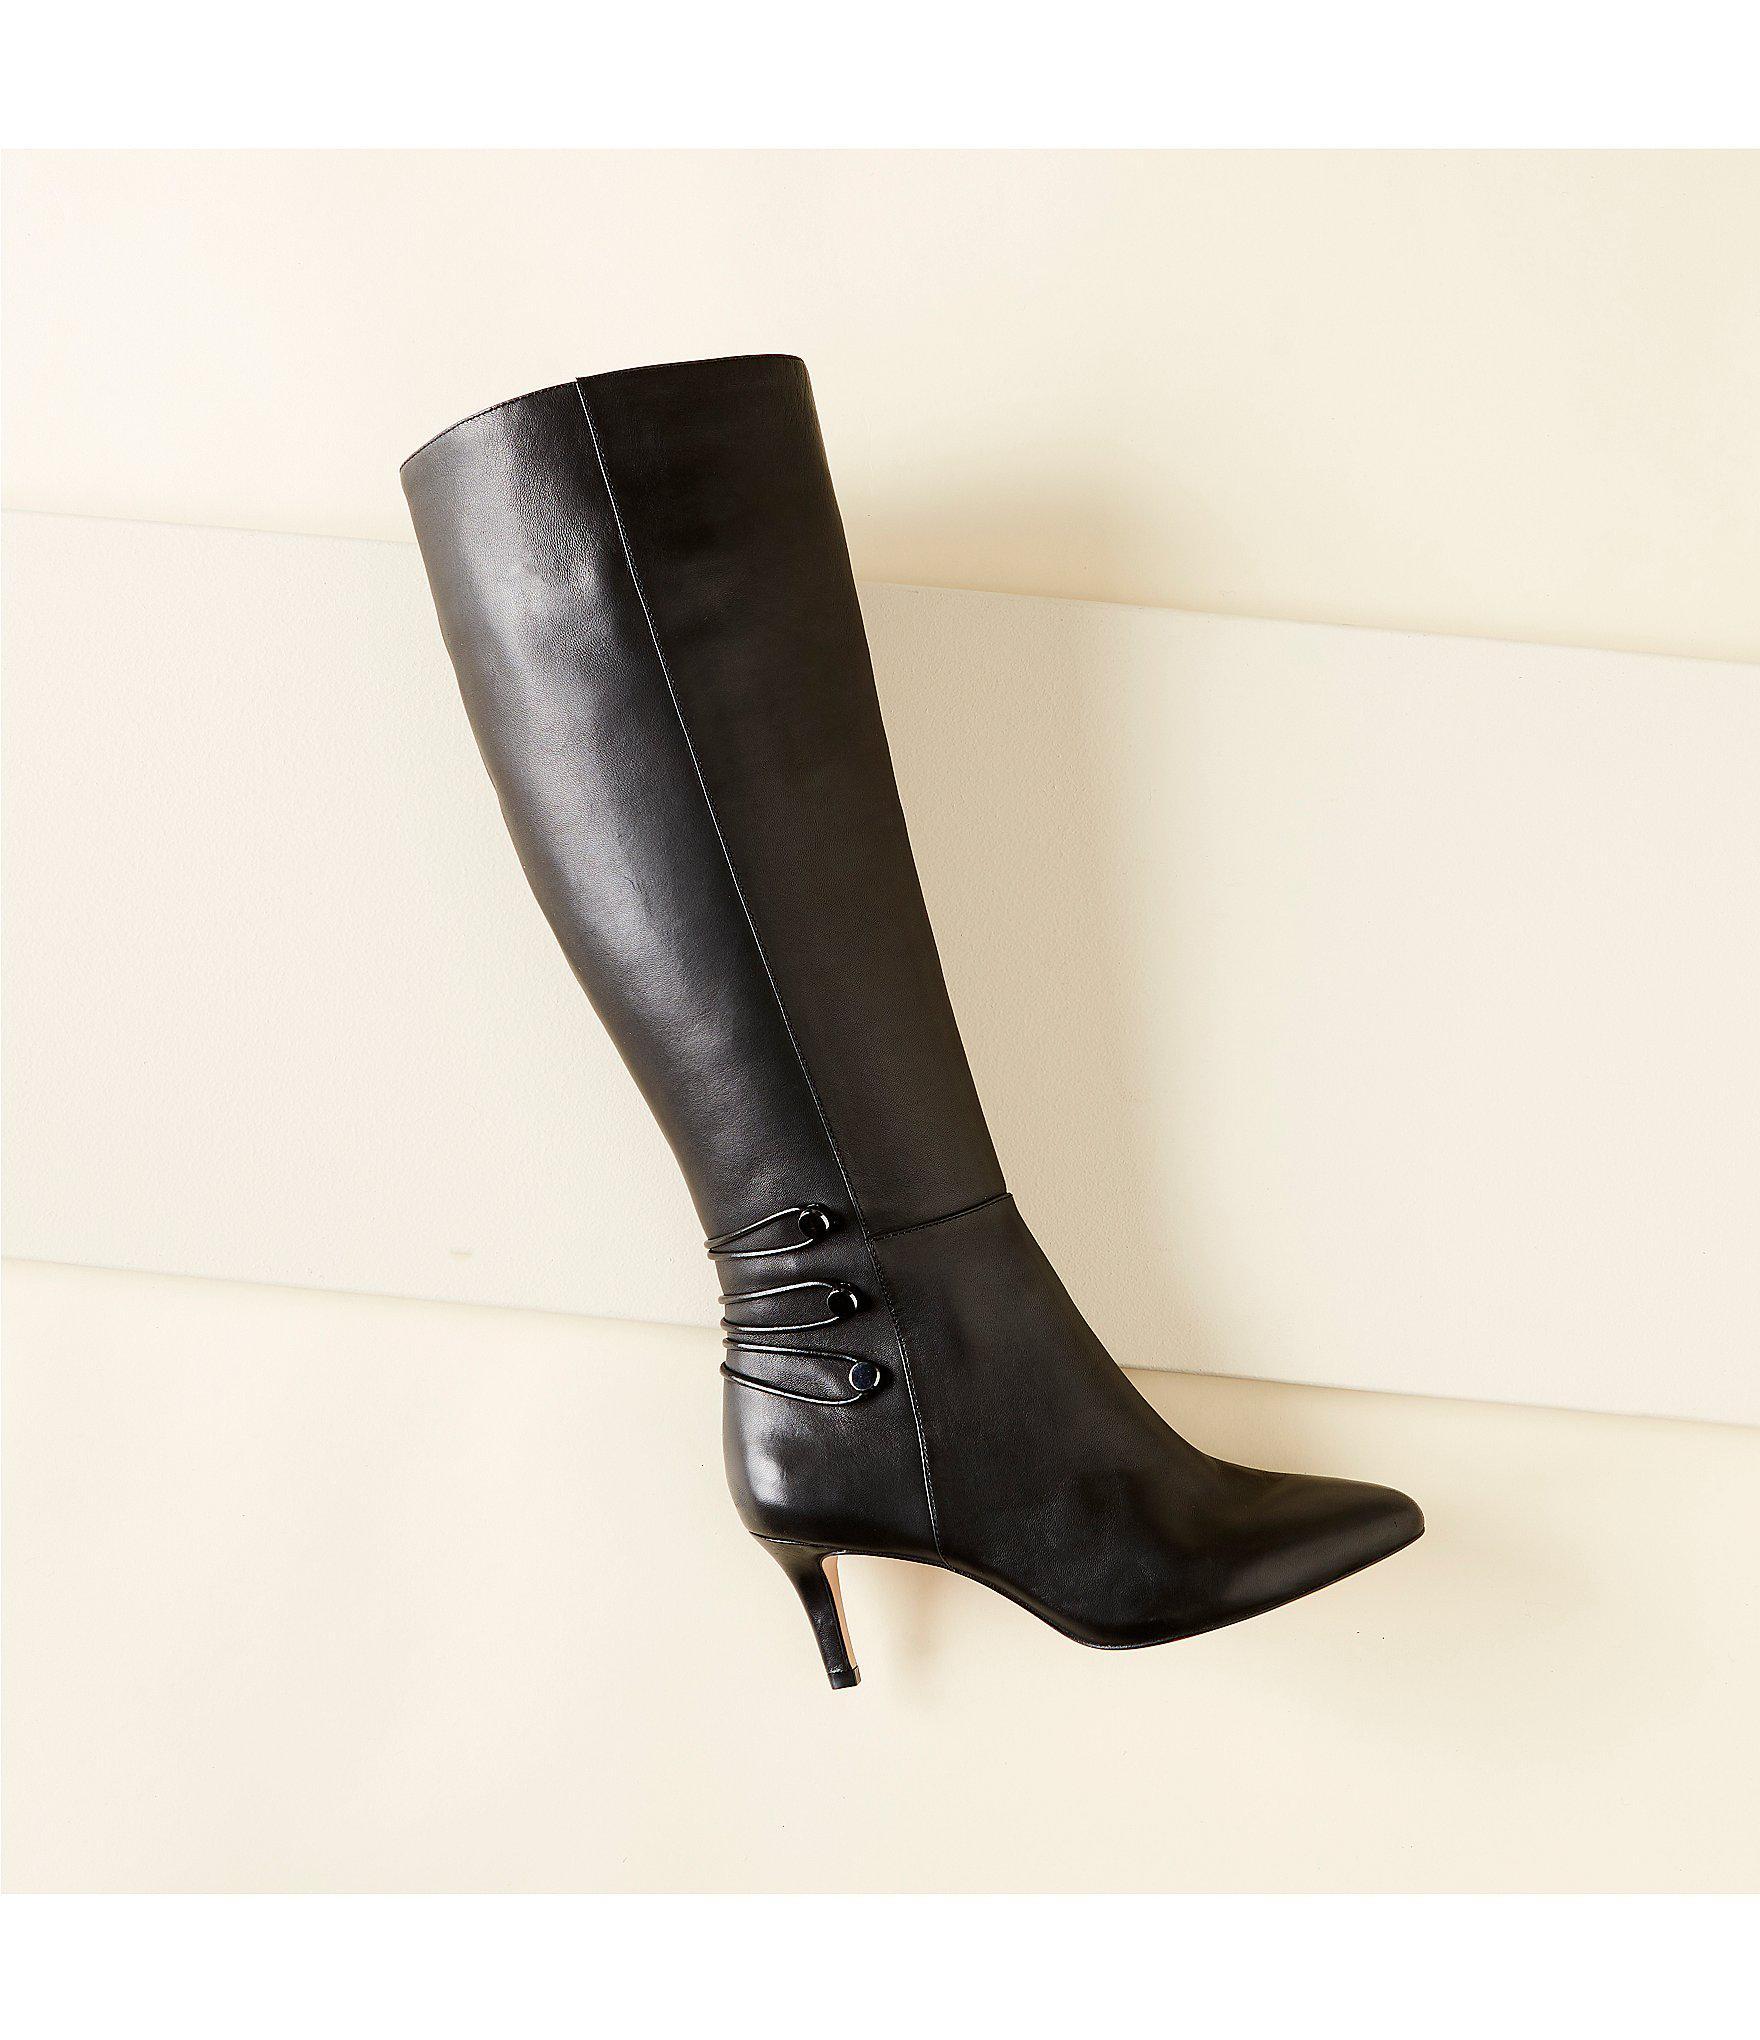 abebfa0838b Antonio Melani Fayee Leather Dress Boots in Black - Lyst